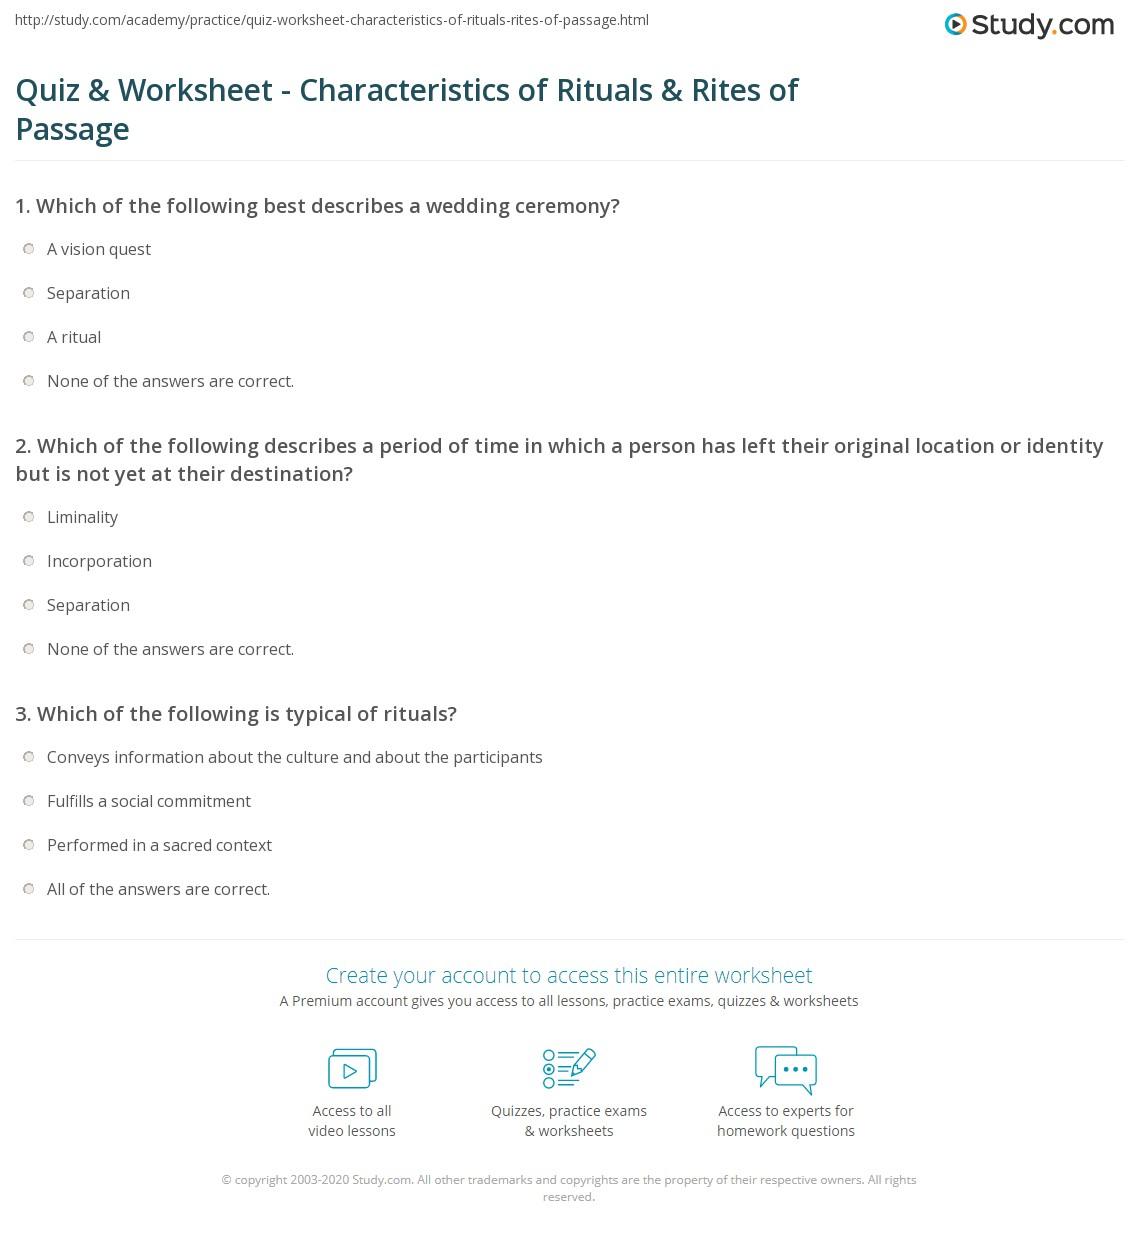 Quiz & Worksheet - Characteristics of Rituals & Rites of Passage